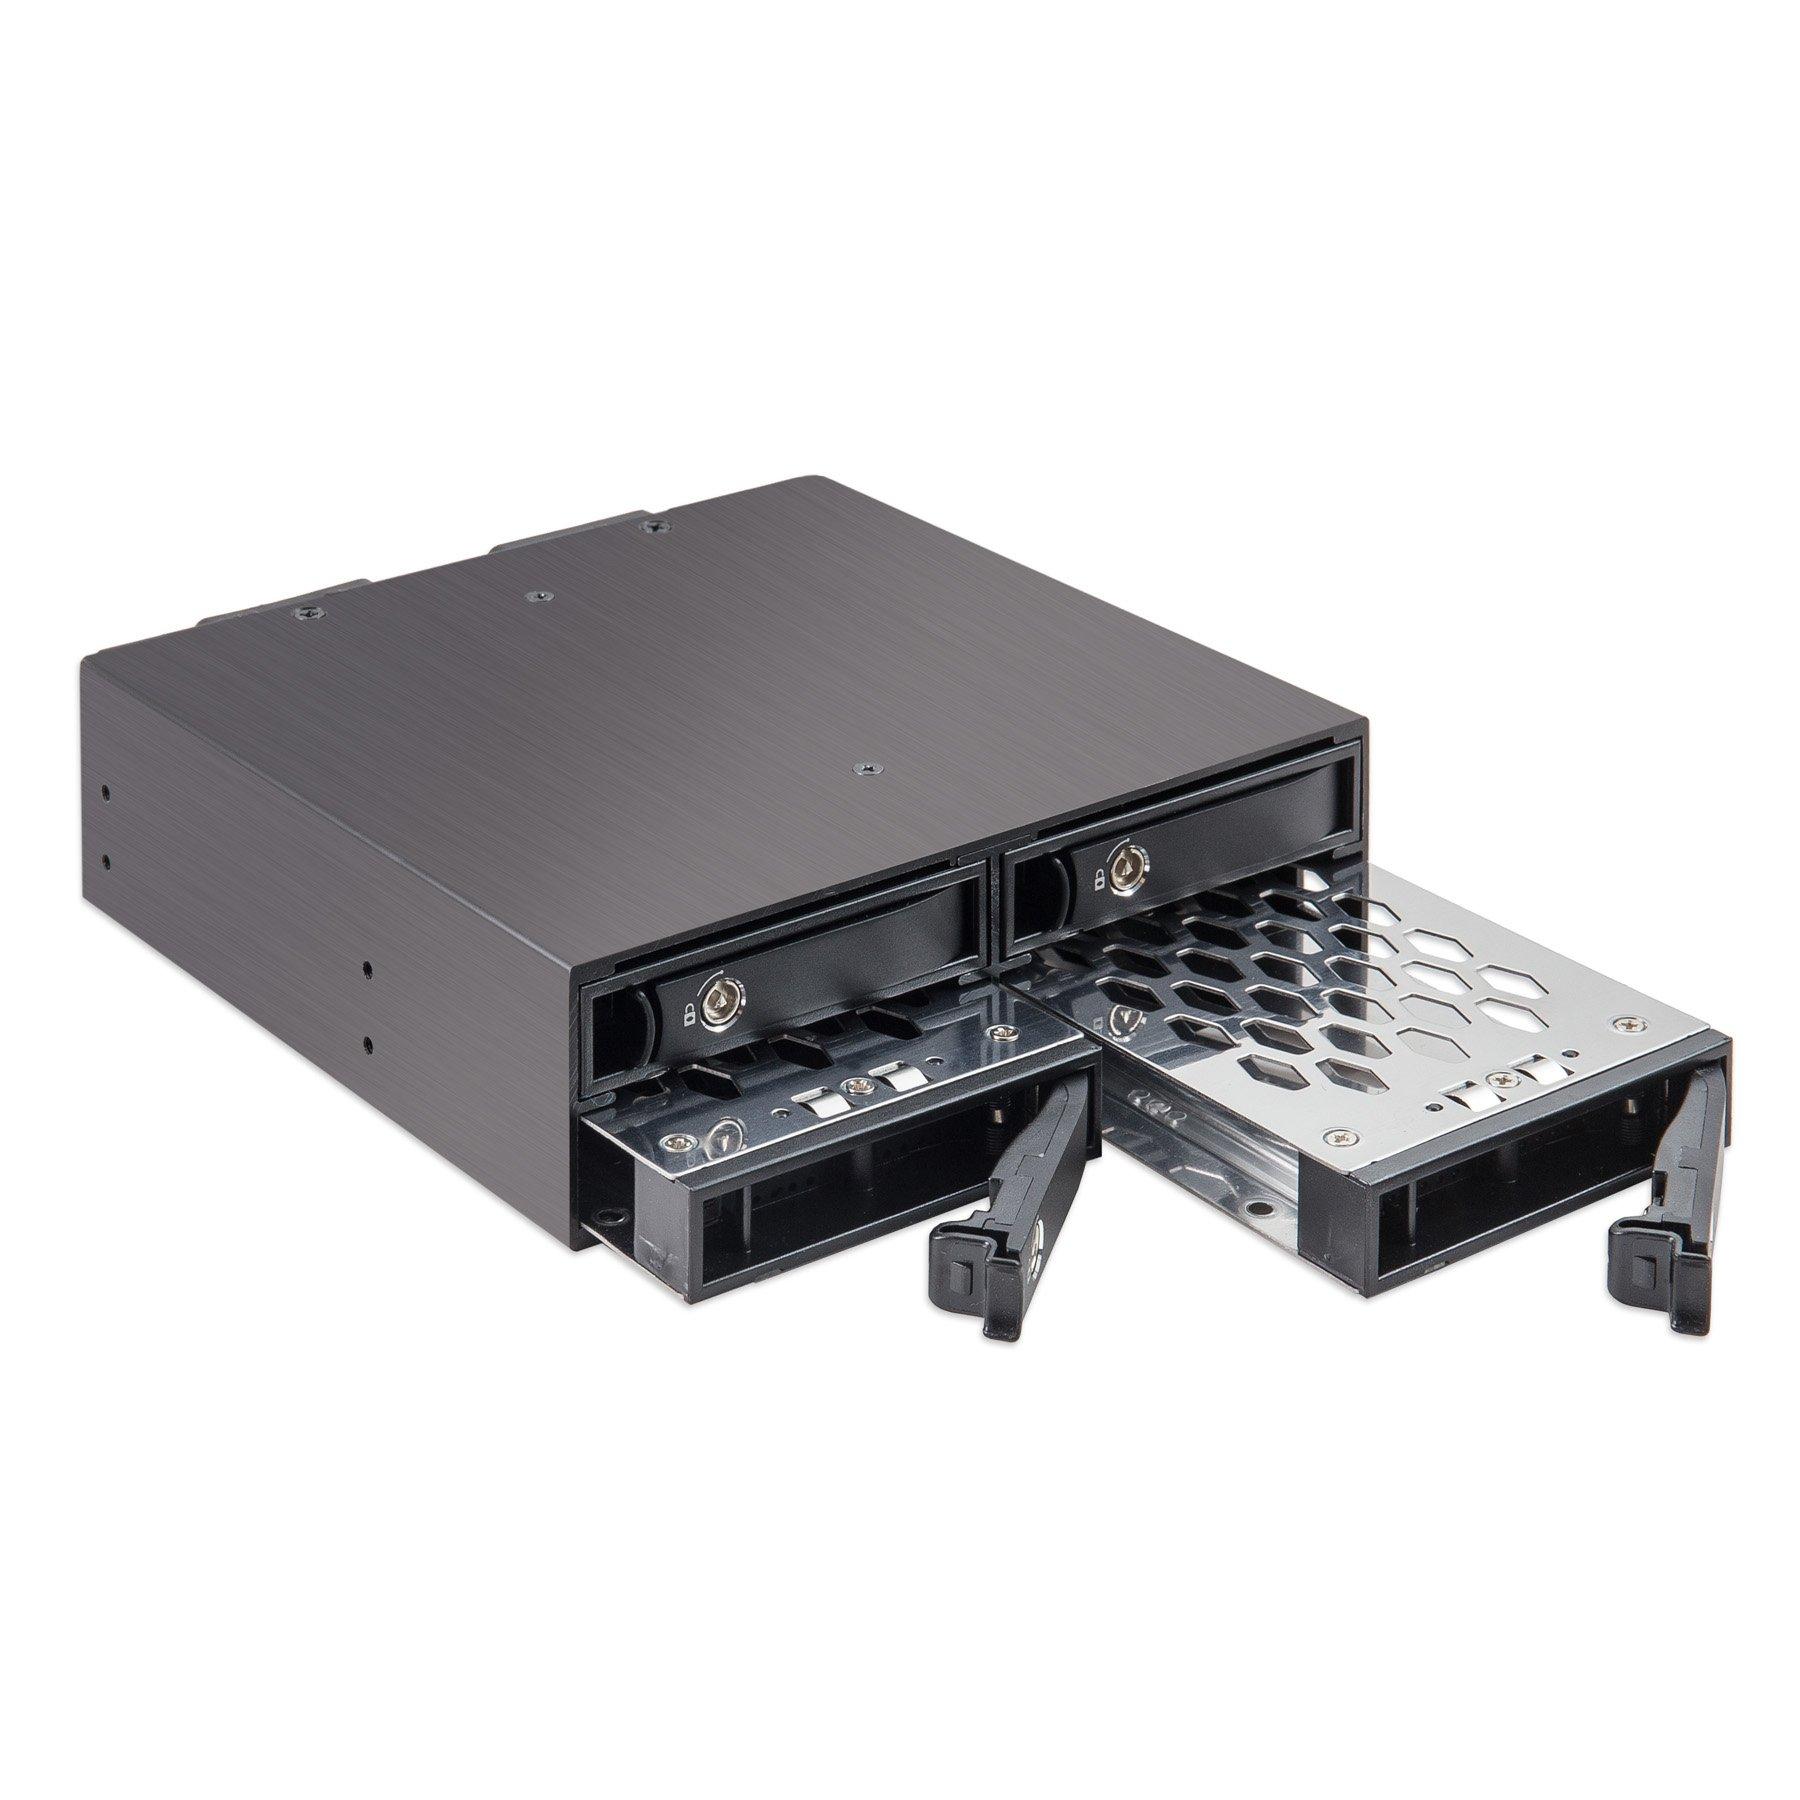 "Syba SY-MRA25038 4 Bay 2.5"" SATA Drive Mobile Rack Mount for 5.25'' Drive Bay"